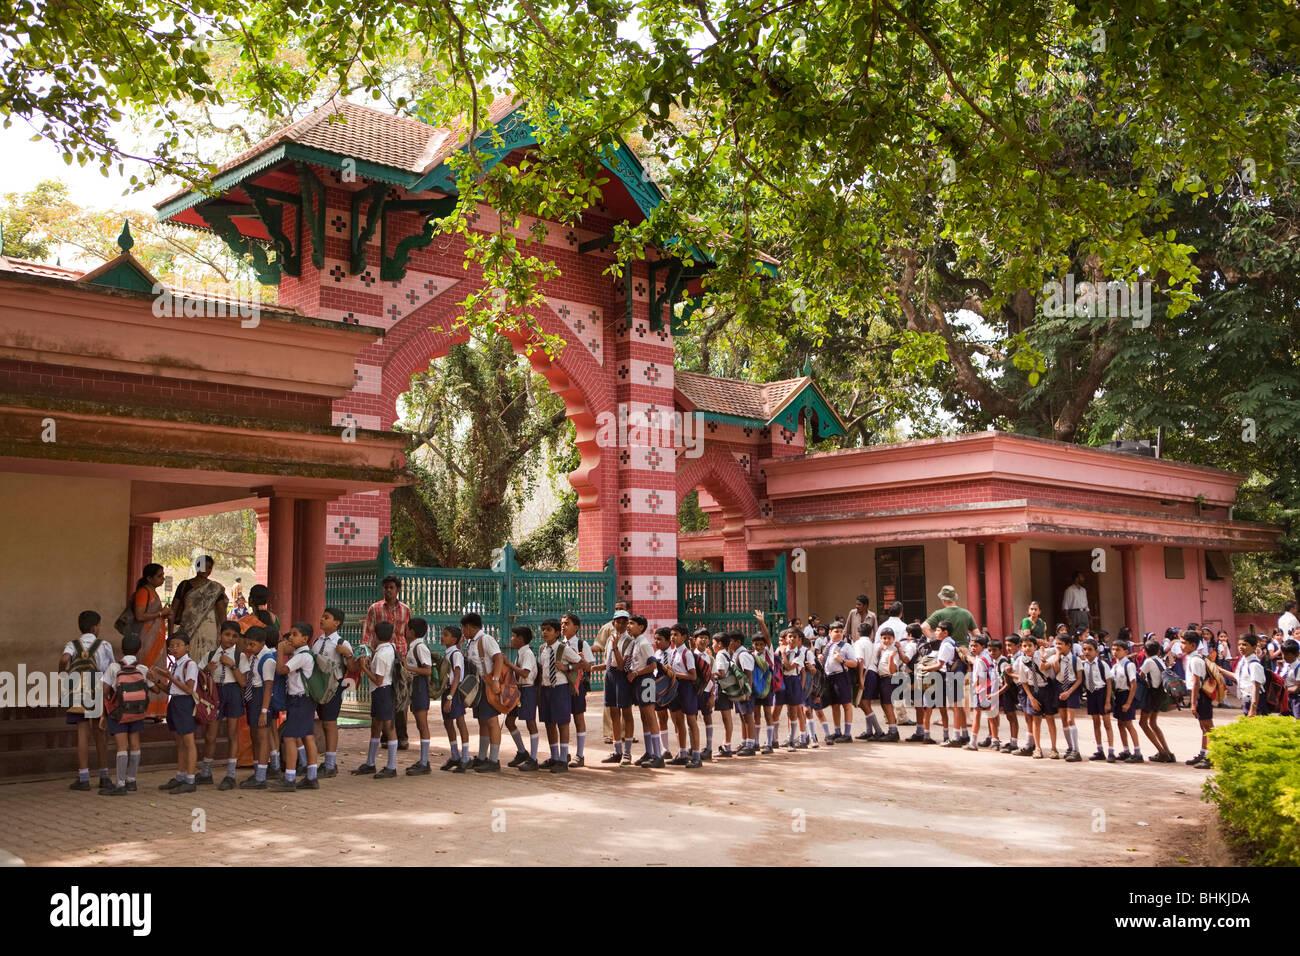 India, Kerala, Thiruvananthapuram, (Trivandrum), Zoological Gardens, group of schoolchildren lined up at entrance - Stock Image